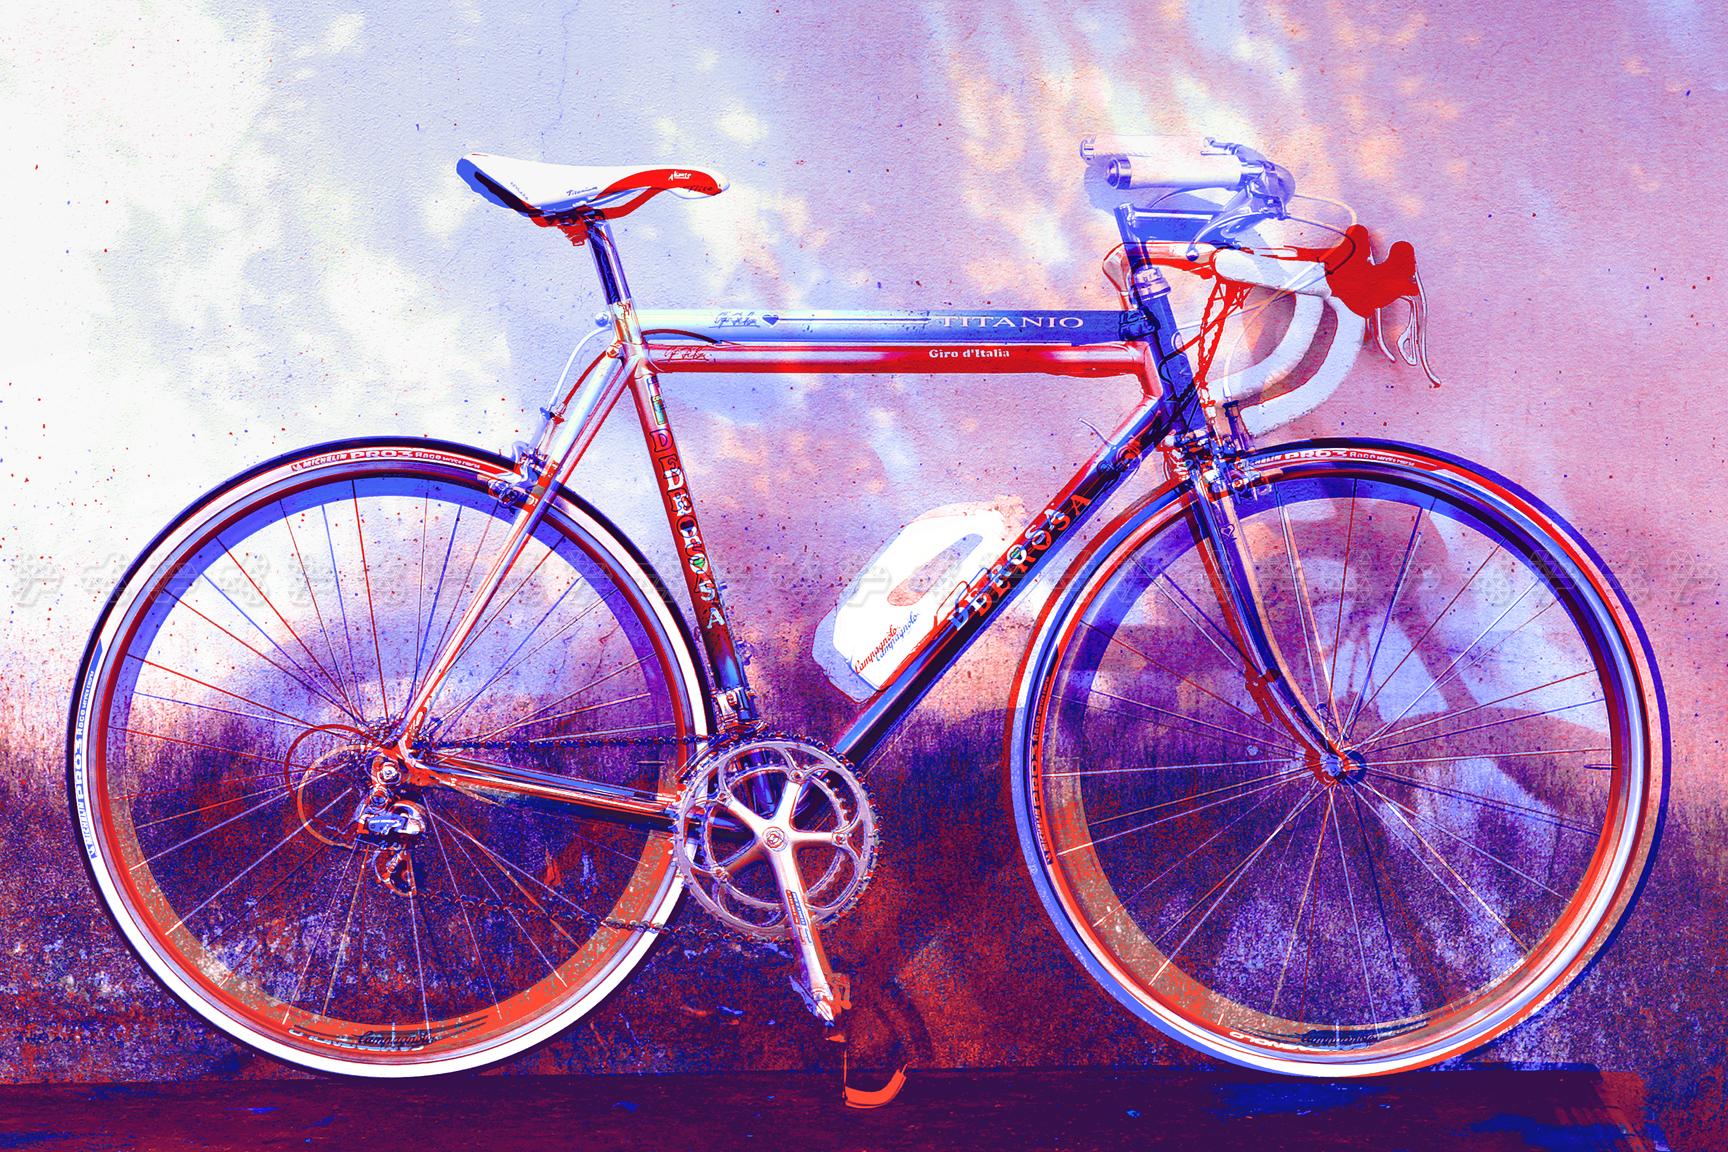 http://lolografico.com/img/translucent.jpg